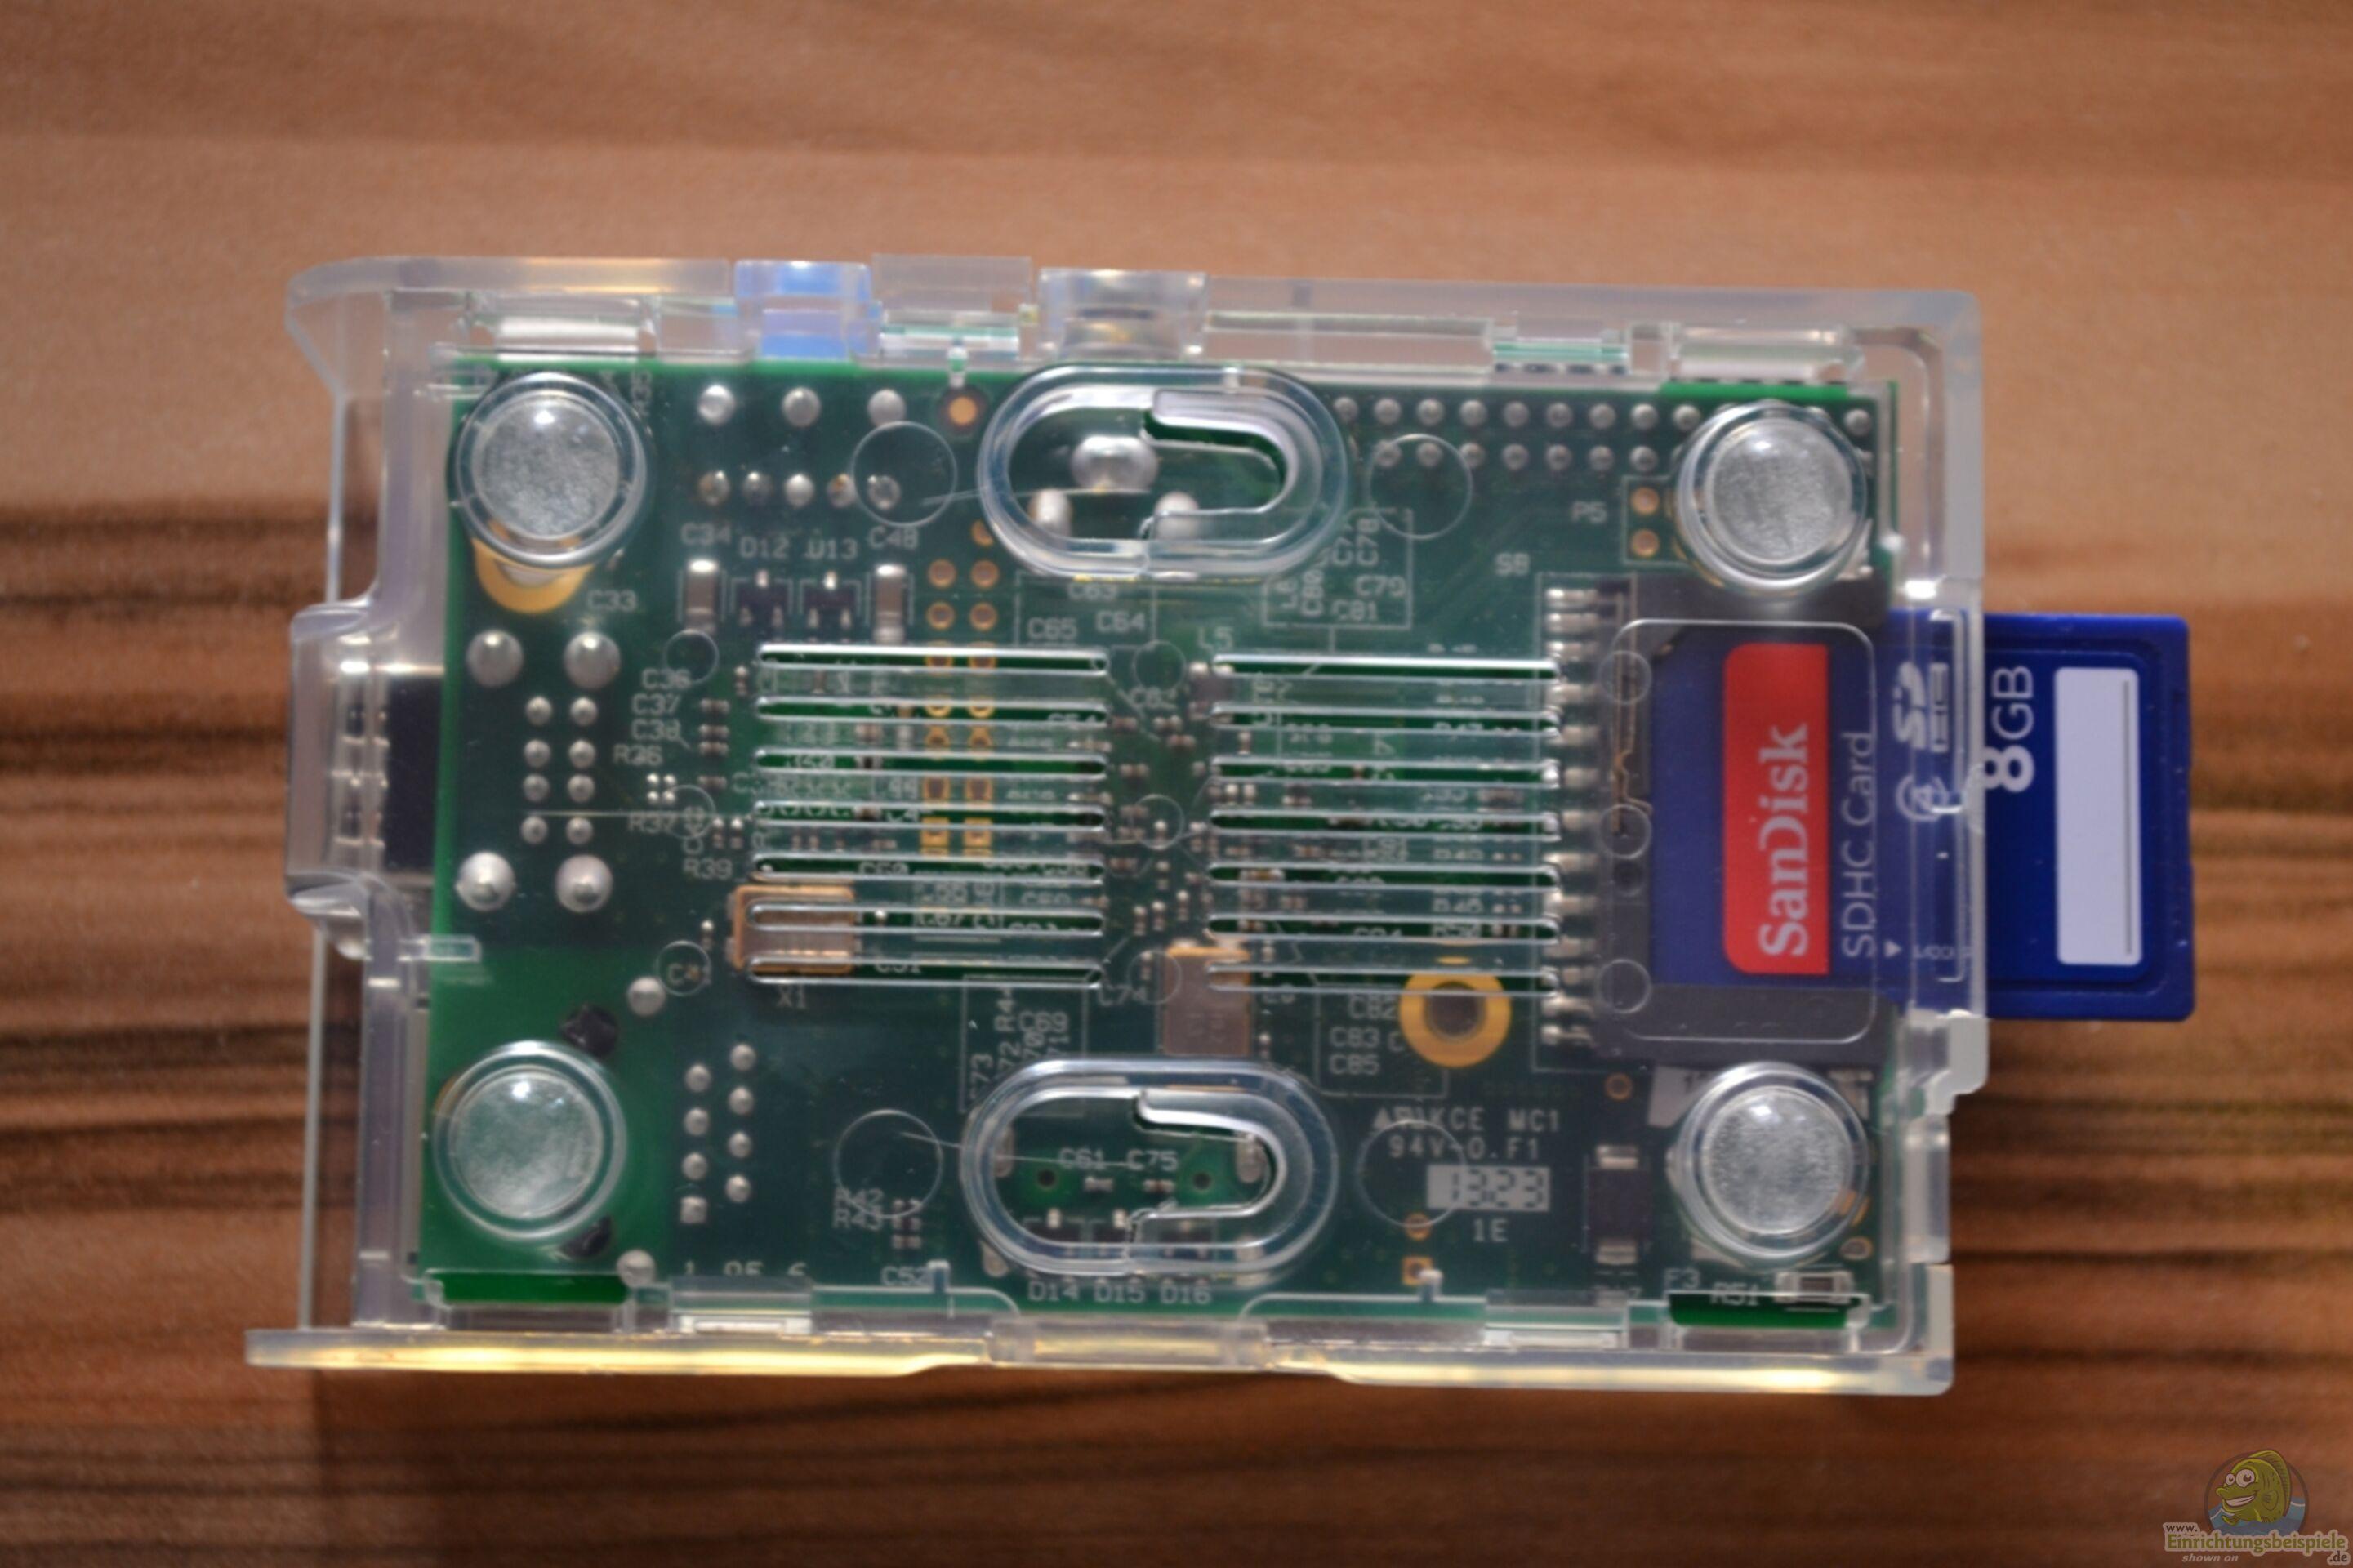 Raspi Aq V 10 Wir Basteln Uns Artikel 4872 Atlas Scientific Orp Circuit Sensor For Arduino Ebay Einen Eigenen Aquariencomputer